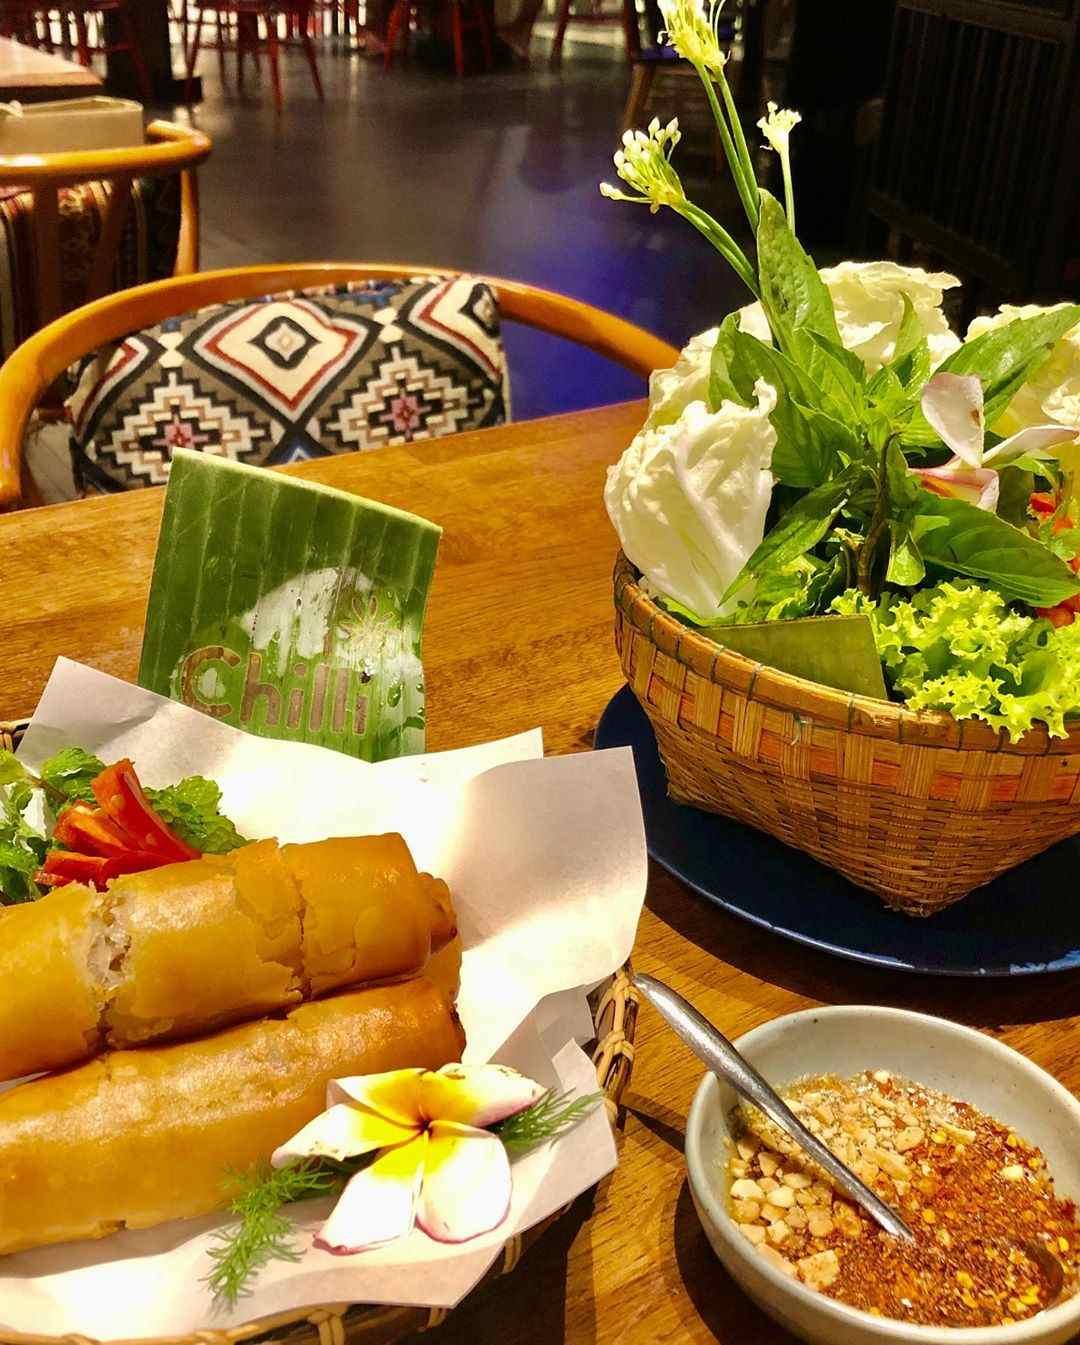 Spring rolls at Chilli Thai in Siam Paragon, Bangkok